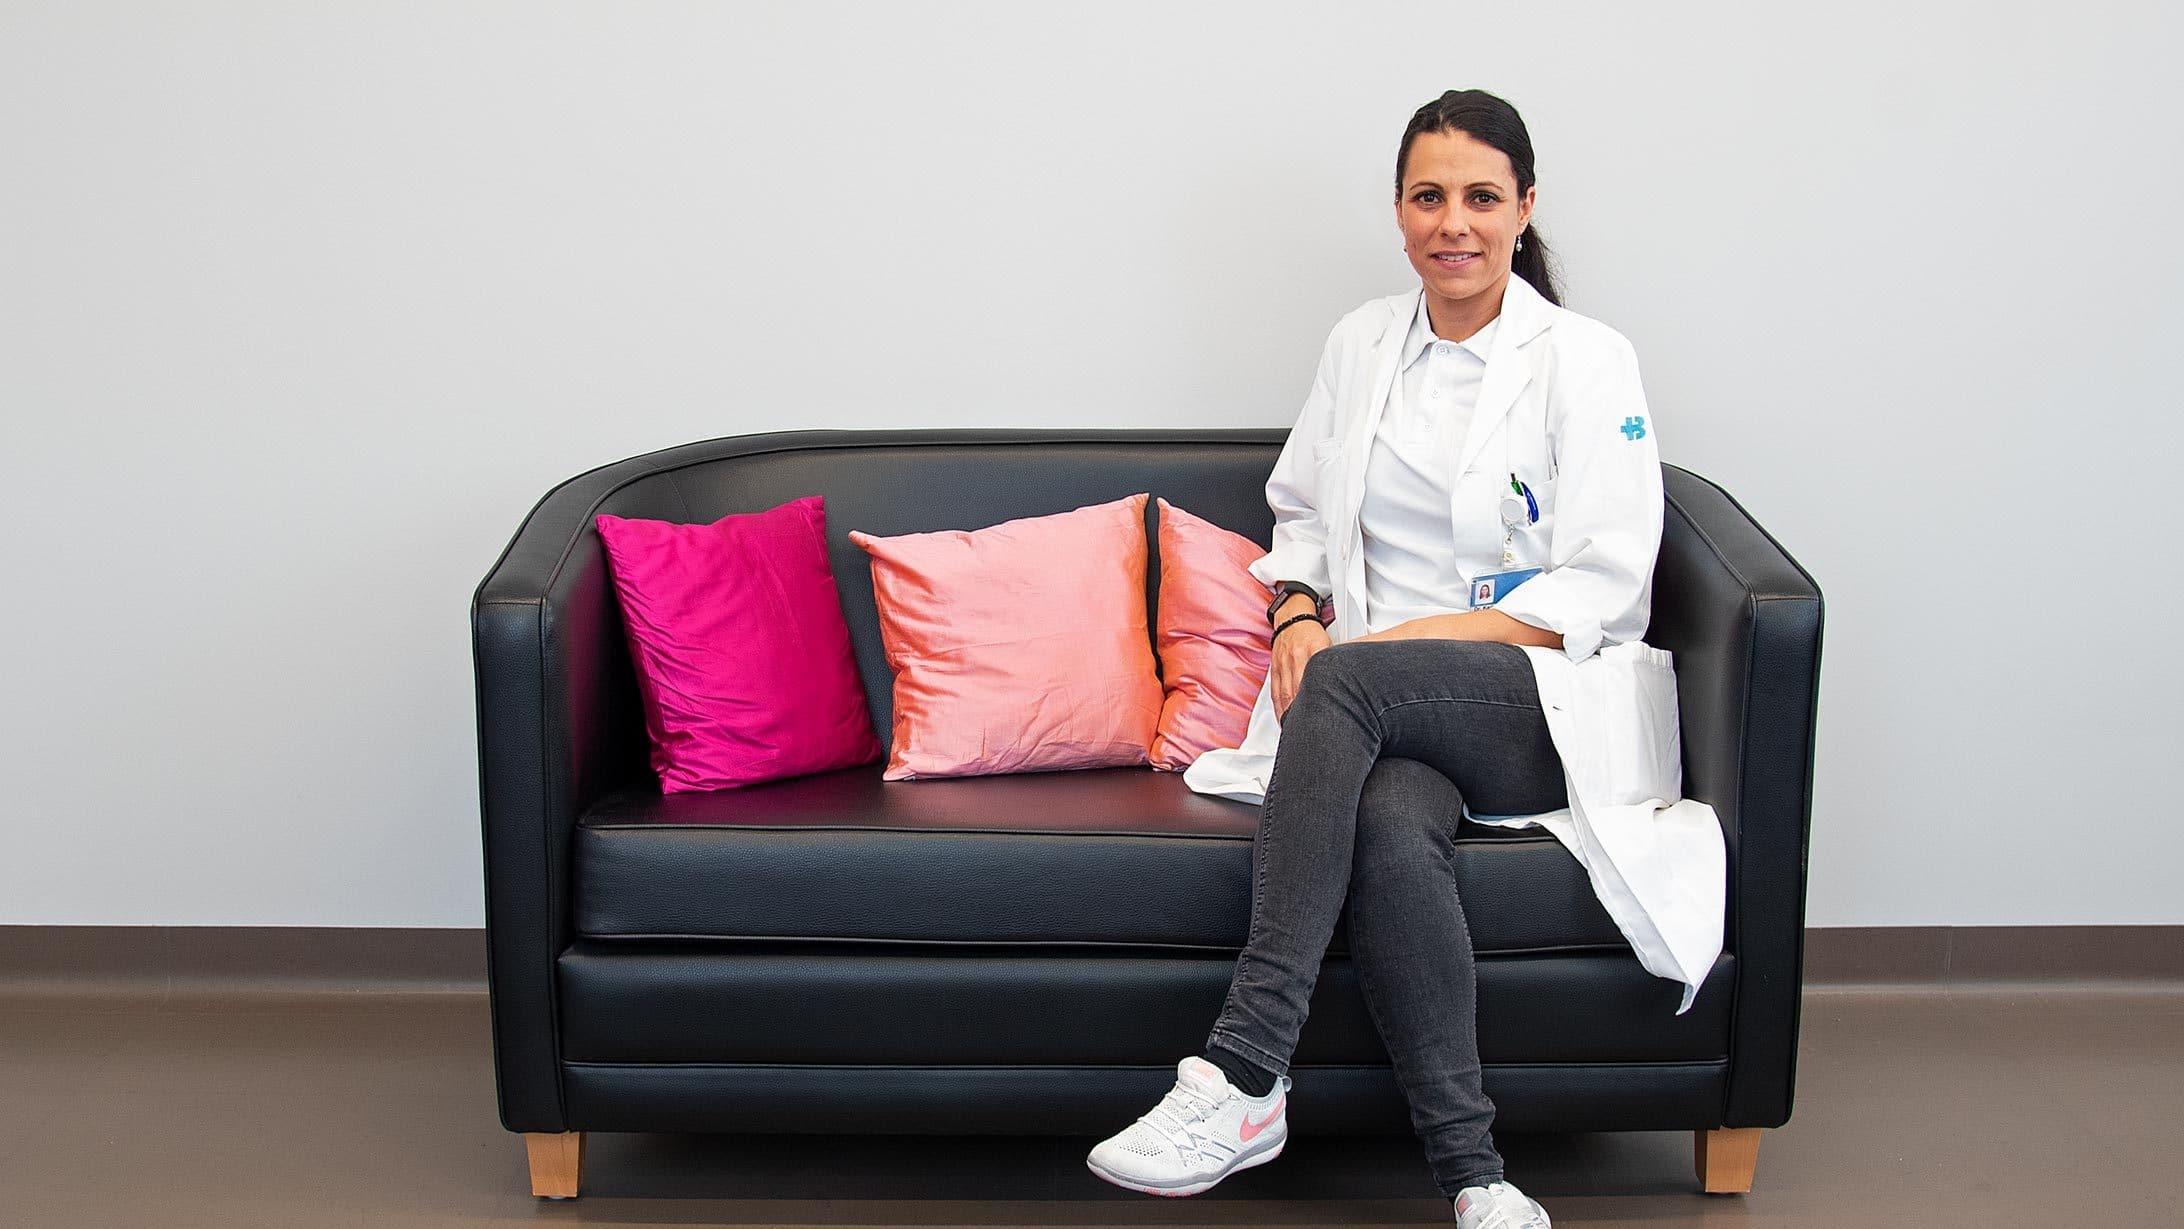 Karin Hofmann ist Gynopsychiaterin und Konsiliarärztin am KSB.